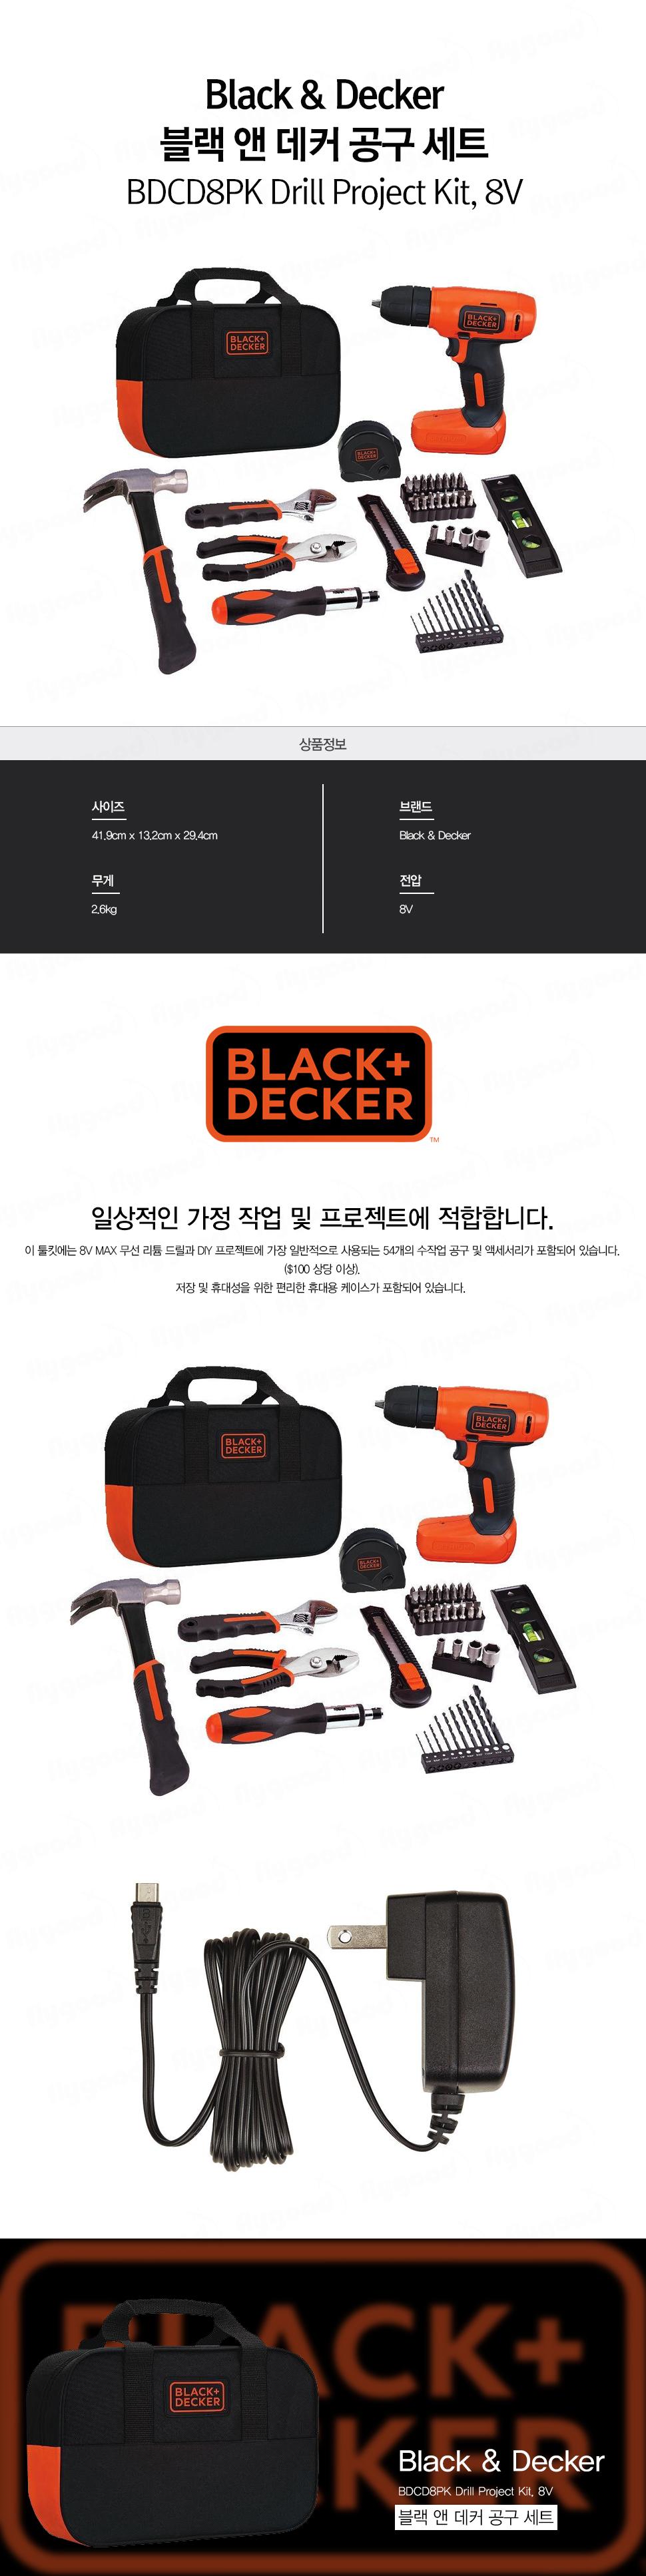 Black-Decker_BDCD8PK_Drill_Project_Kit_8V.jpg